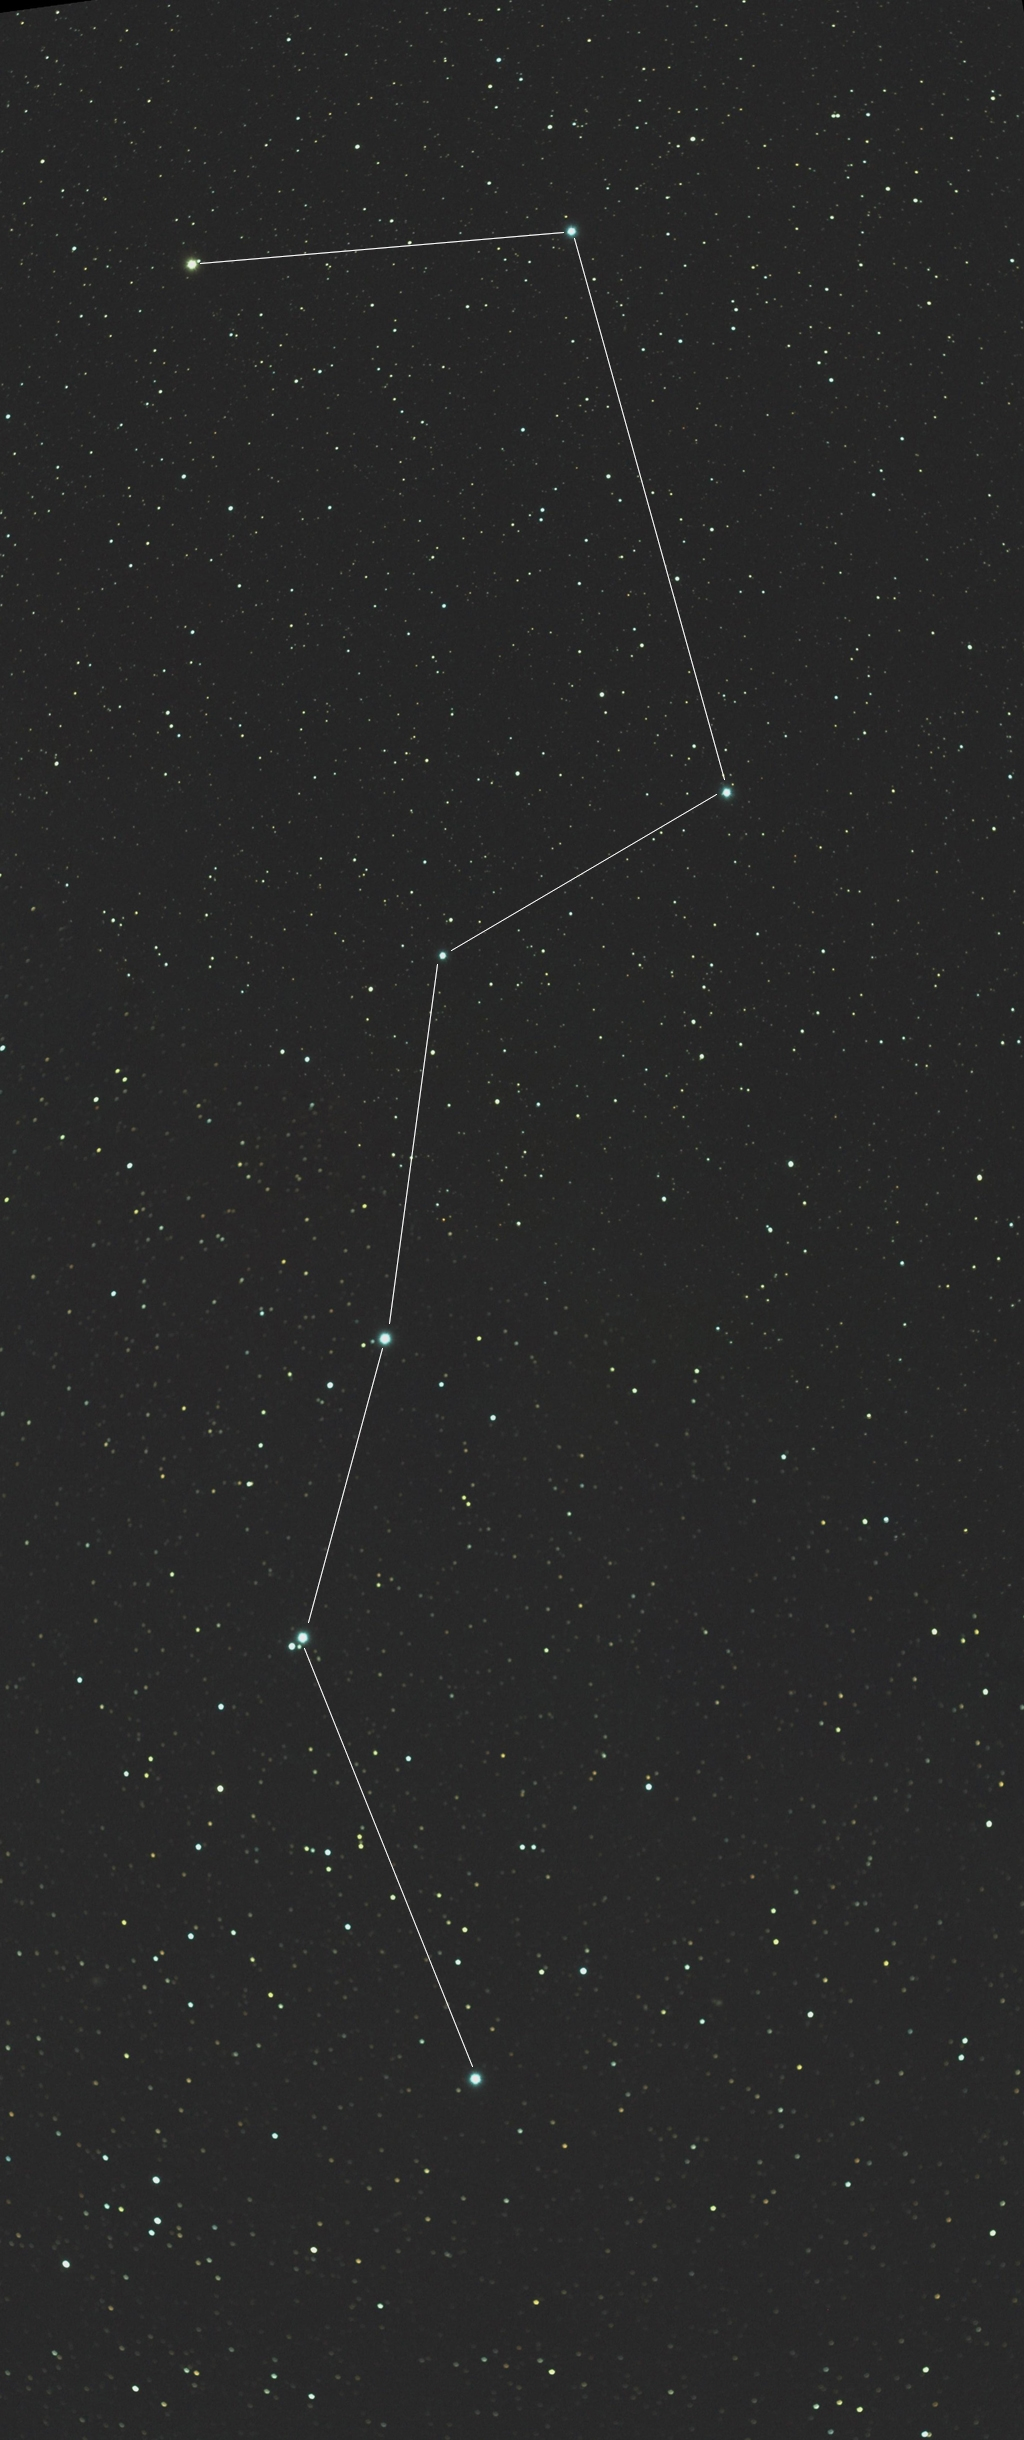 quelques constellations ...sans avions 10042001495240455870465